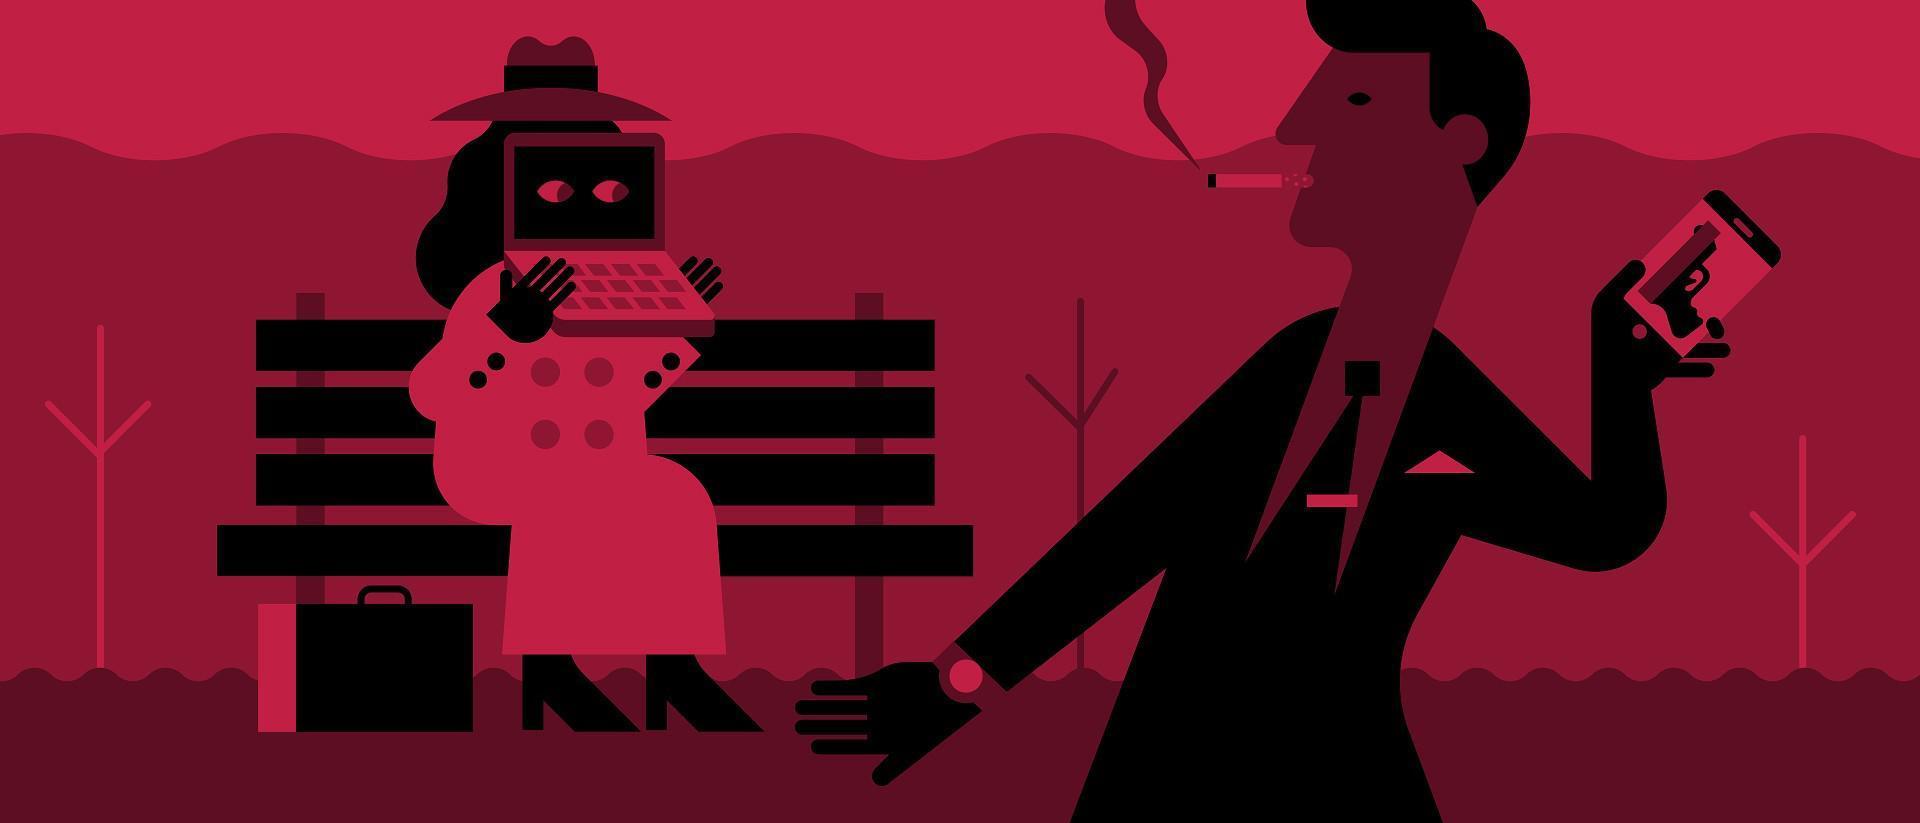 illustrate cyber attack